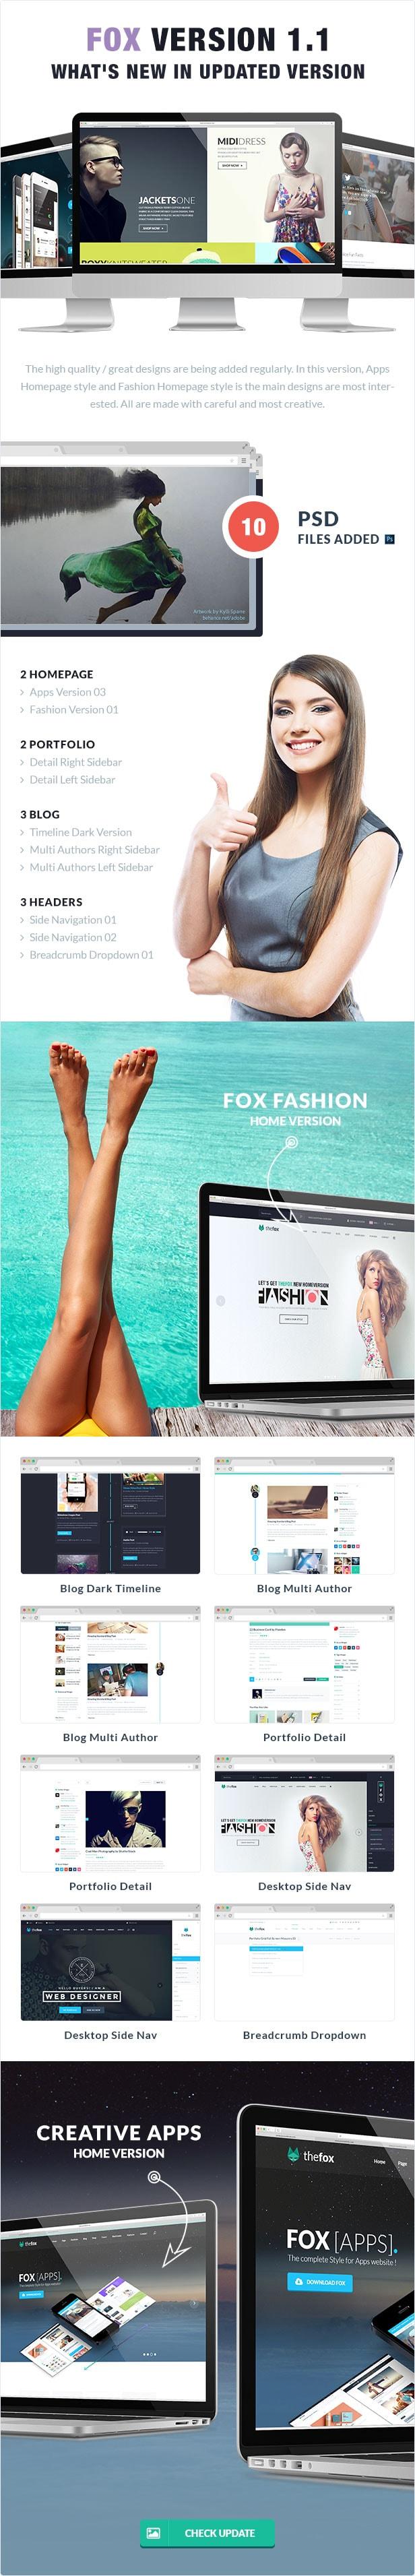 09 thefox psd ver 1 1 update version - TheFox | Multi-Purpose PSD Template